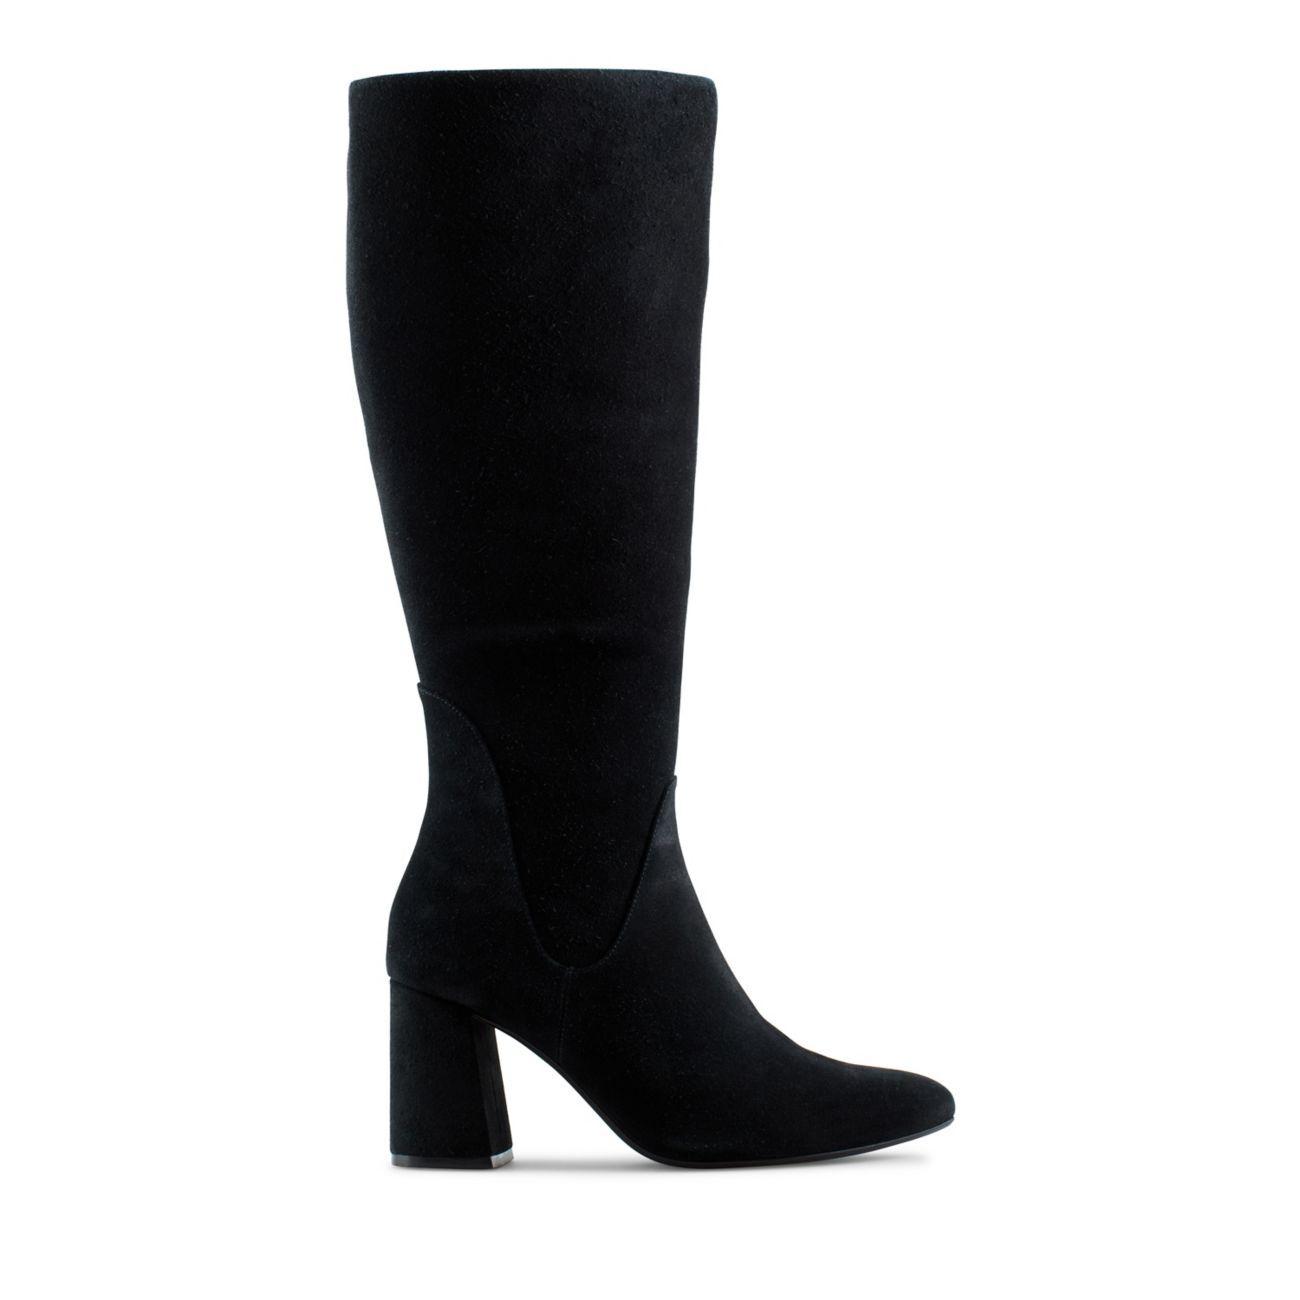 Women's Black Suede Knee High Boots